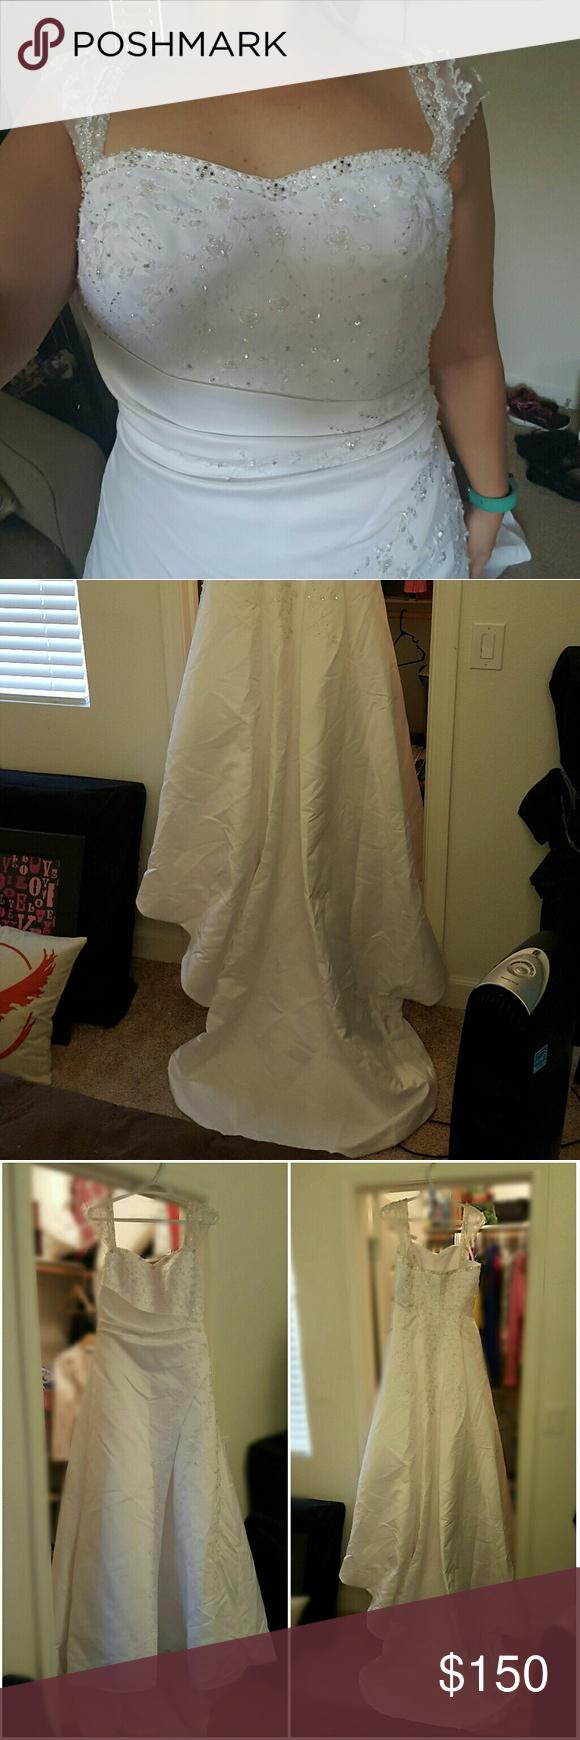 Michaelangelo wedding dress  NWT Michaelangelo wedding gown  NWT  My Posh Picks  Pinterest